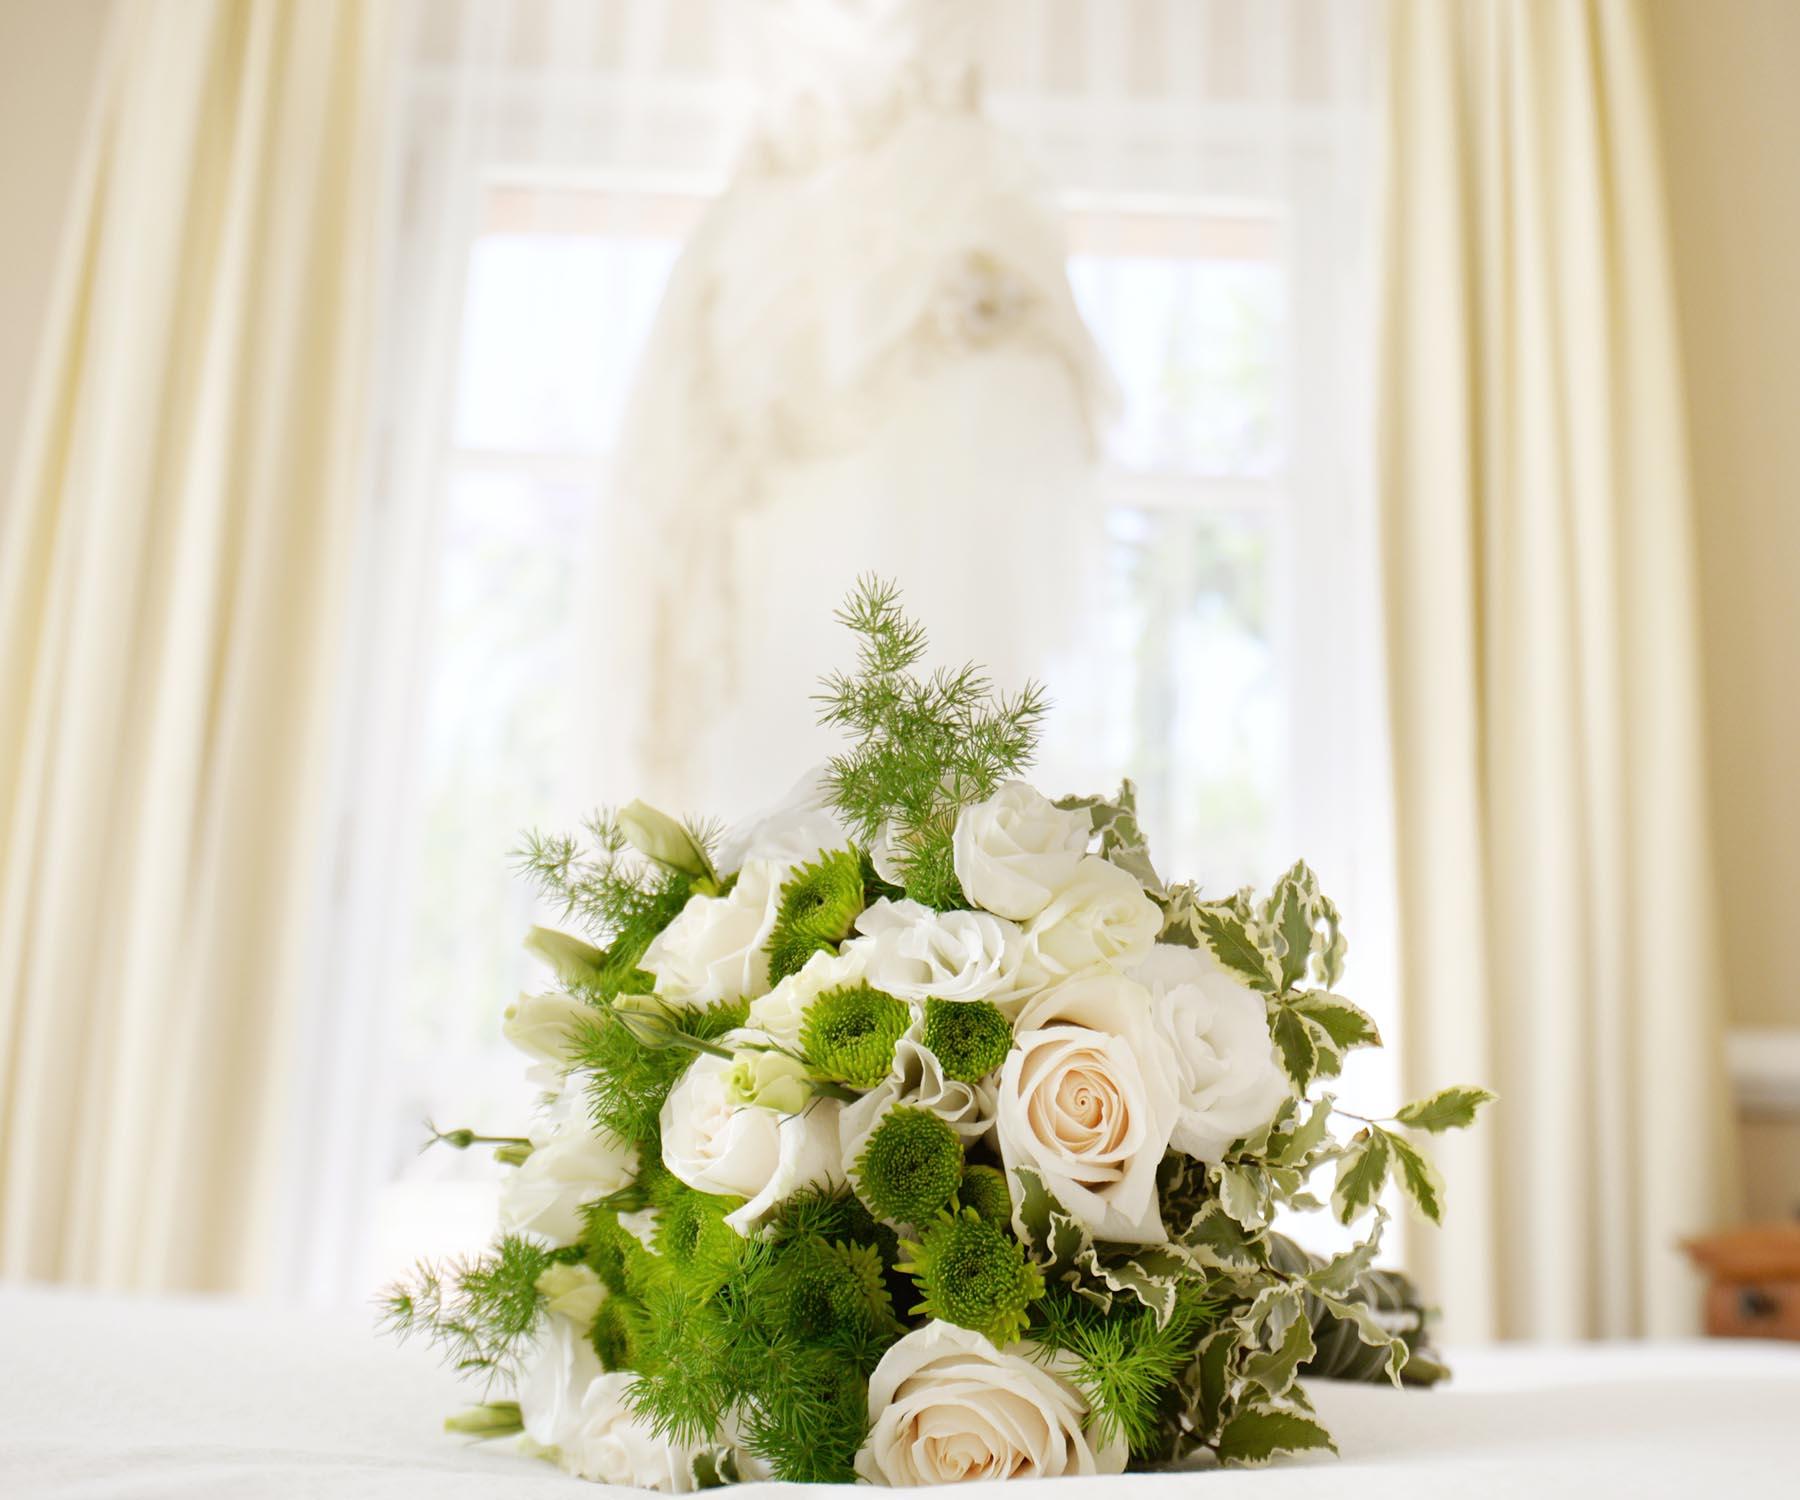 Villa Padierna Palace wedding details